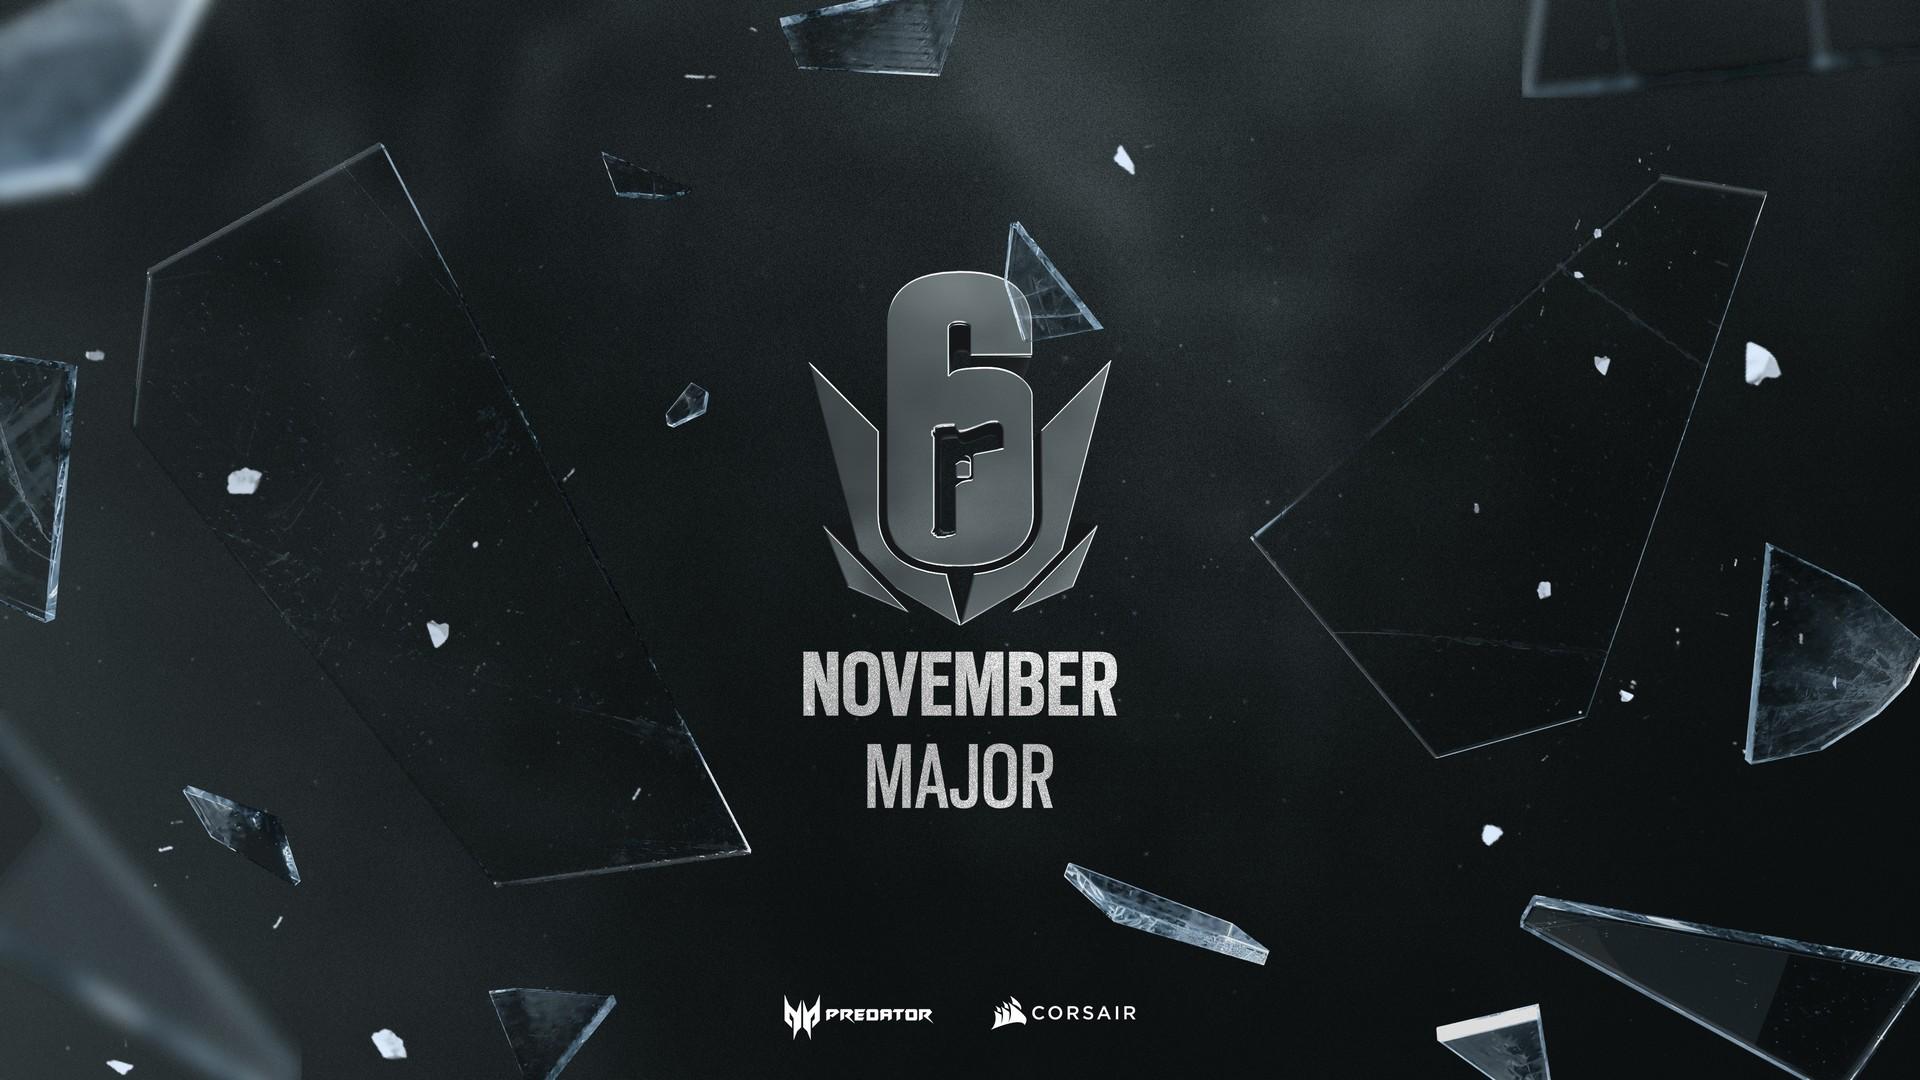 Rainbow Six: Siege Six November Major 2020